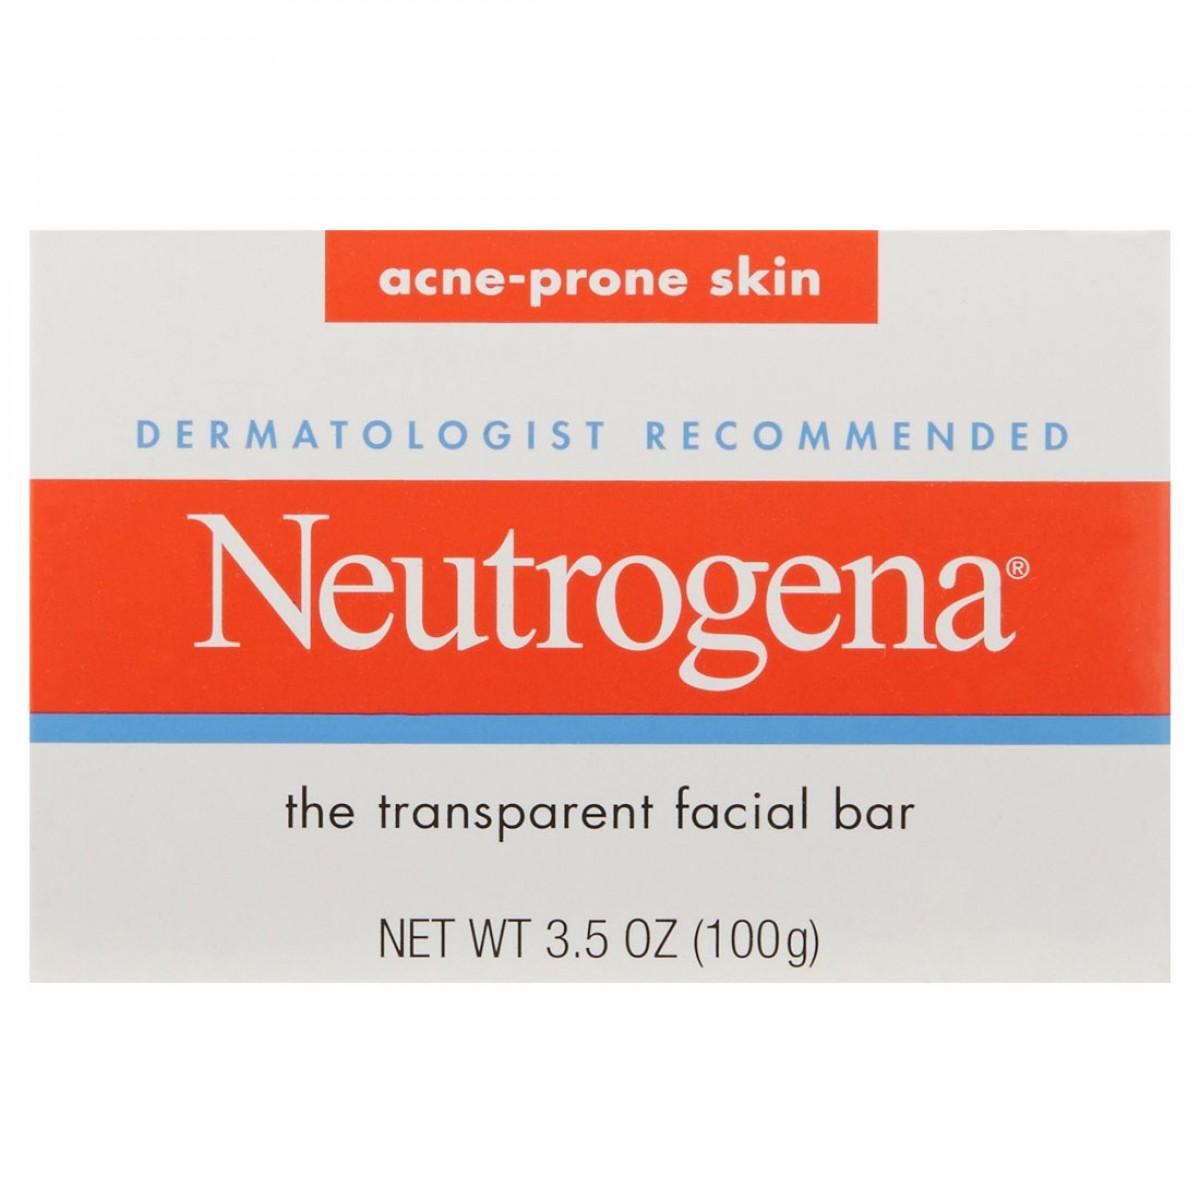 Apologise, neutrogena 35 oz bar facial soap have